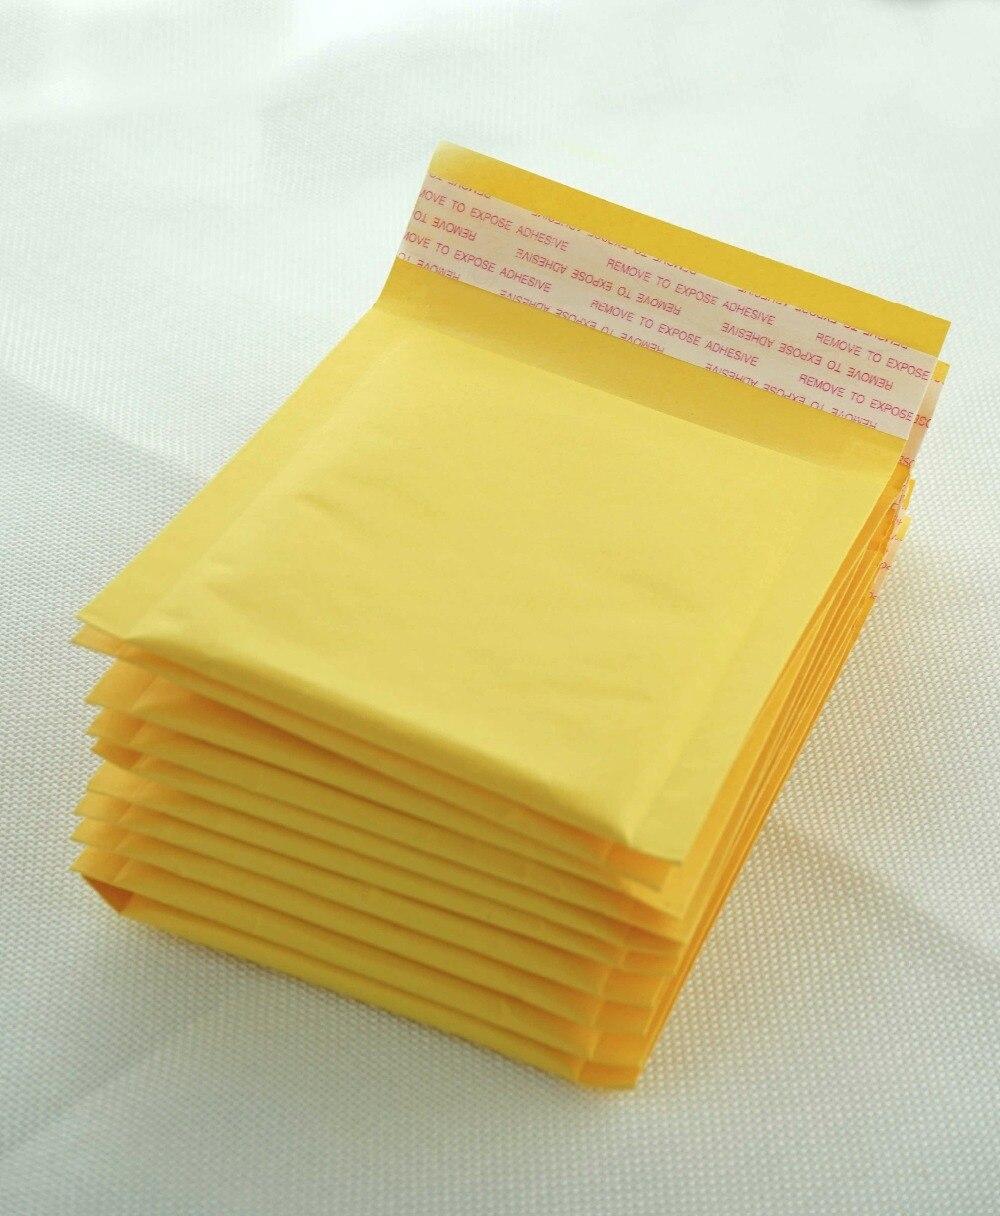 (110x150mm) 10 unids/lote sobres acolchados de burbujas para correo, bolsas de envío, bolsas de sobres de Papel Kraft con burbujas para correo